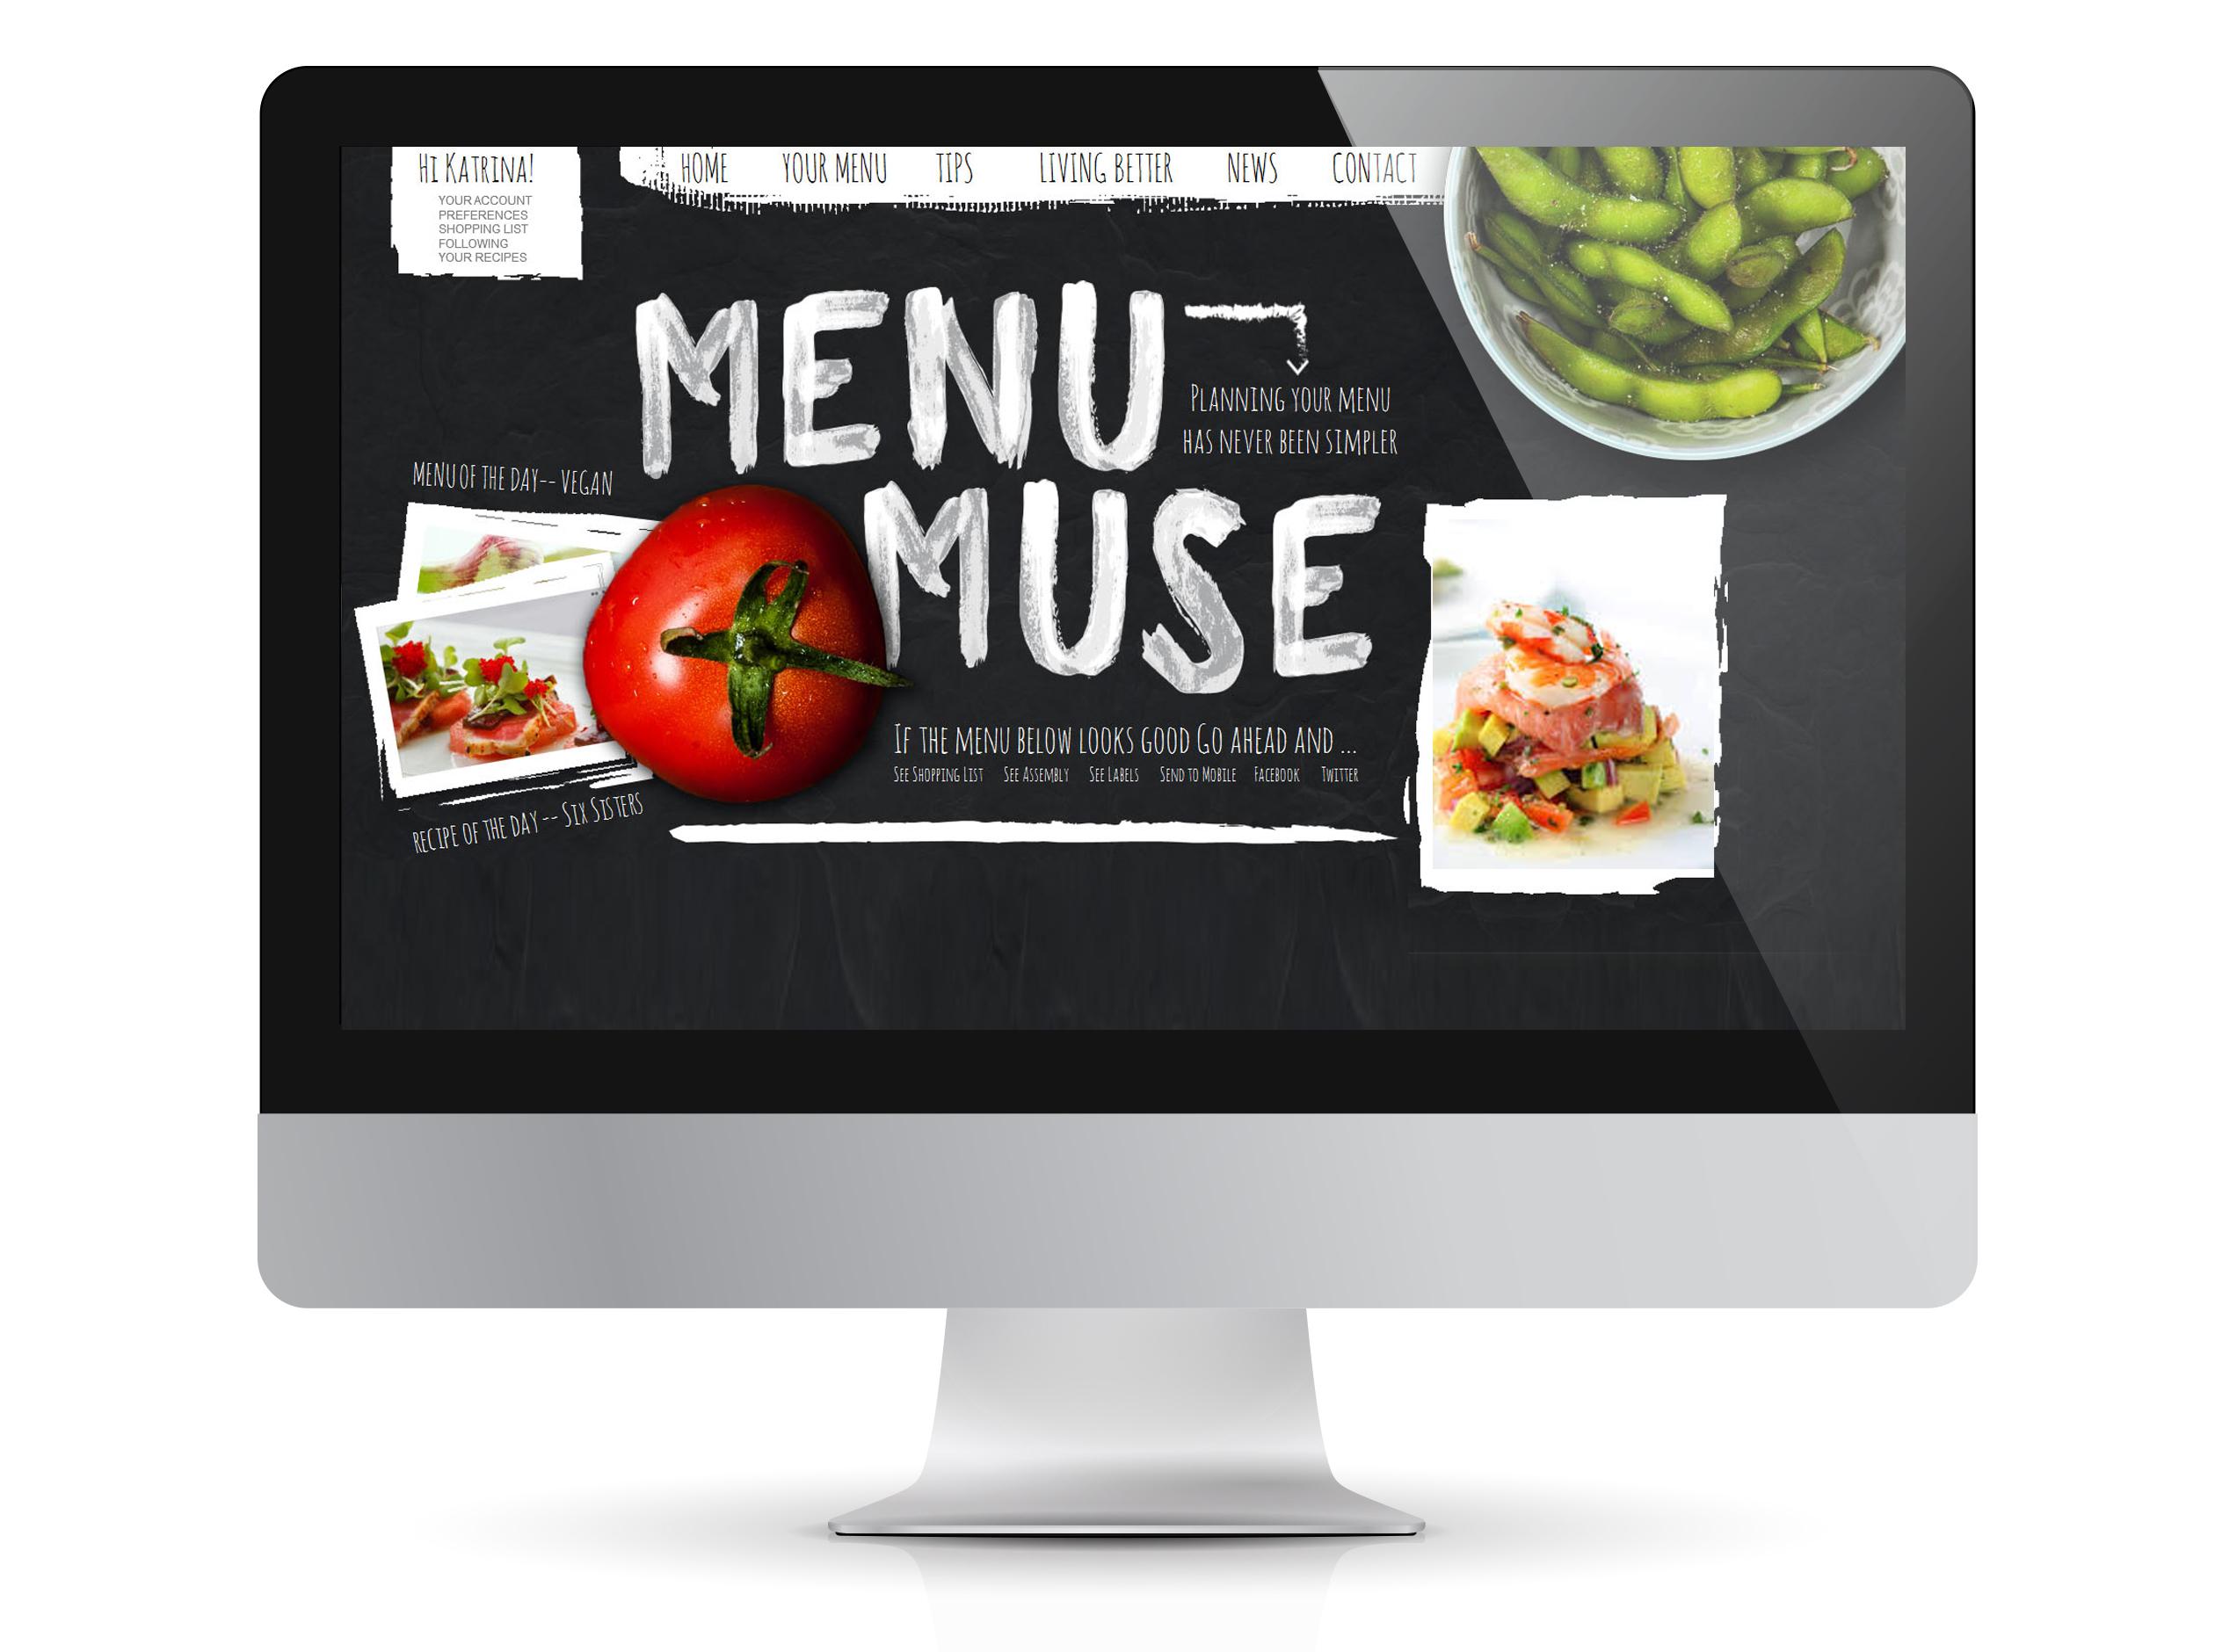 menu-muse